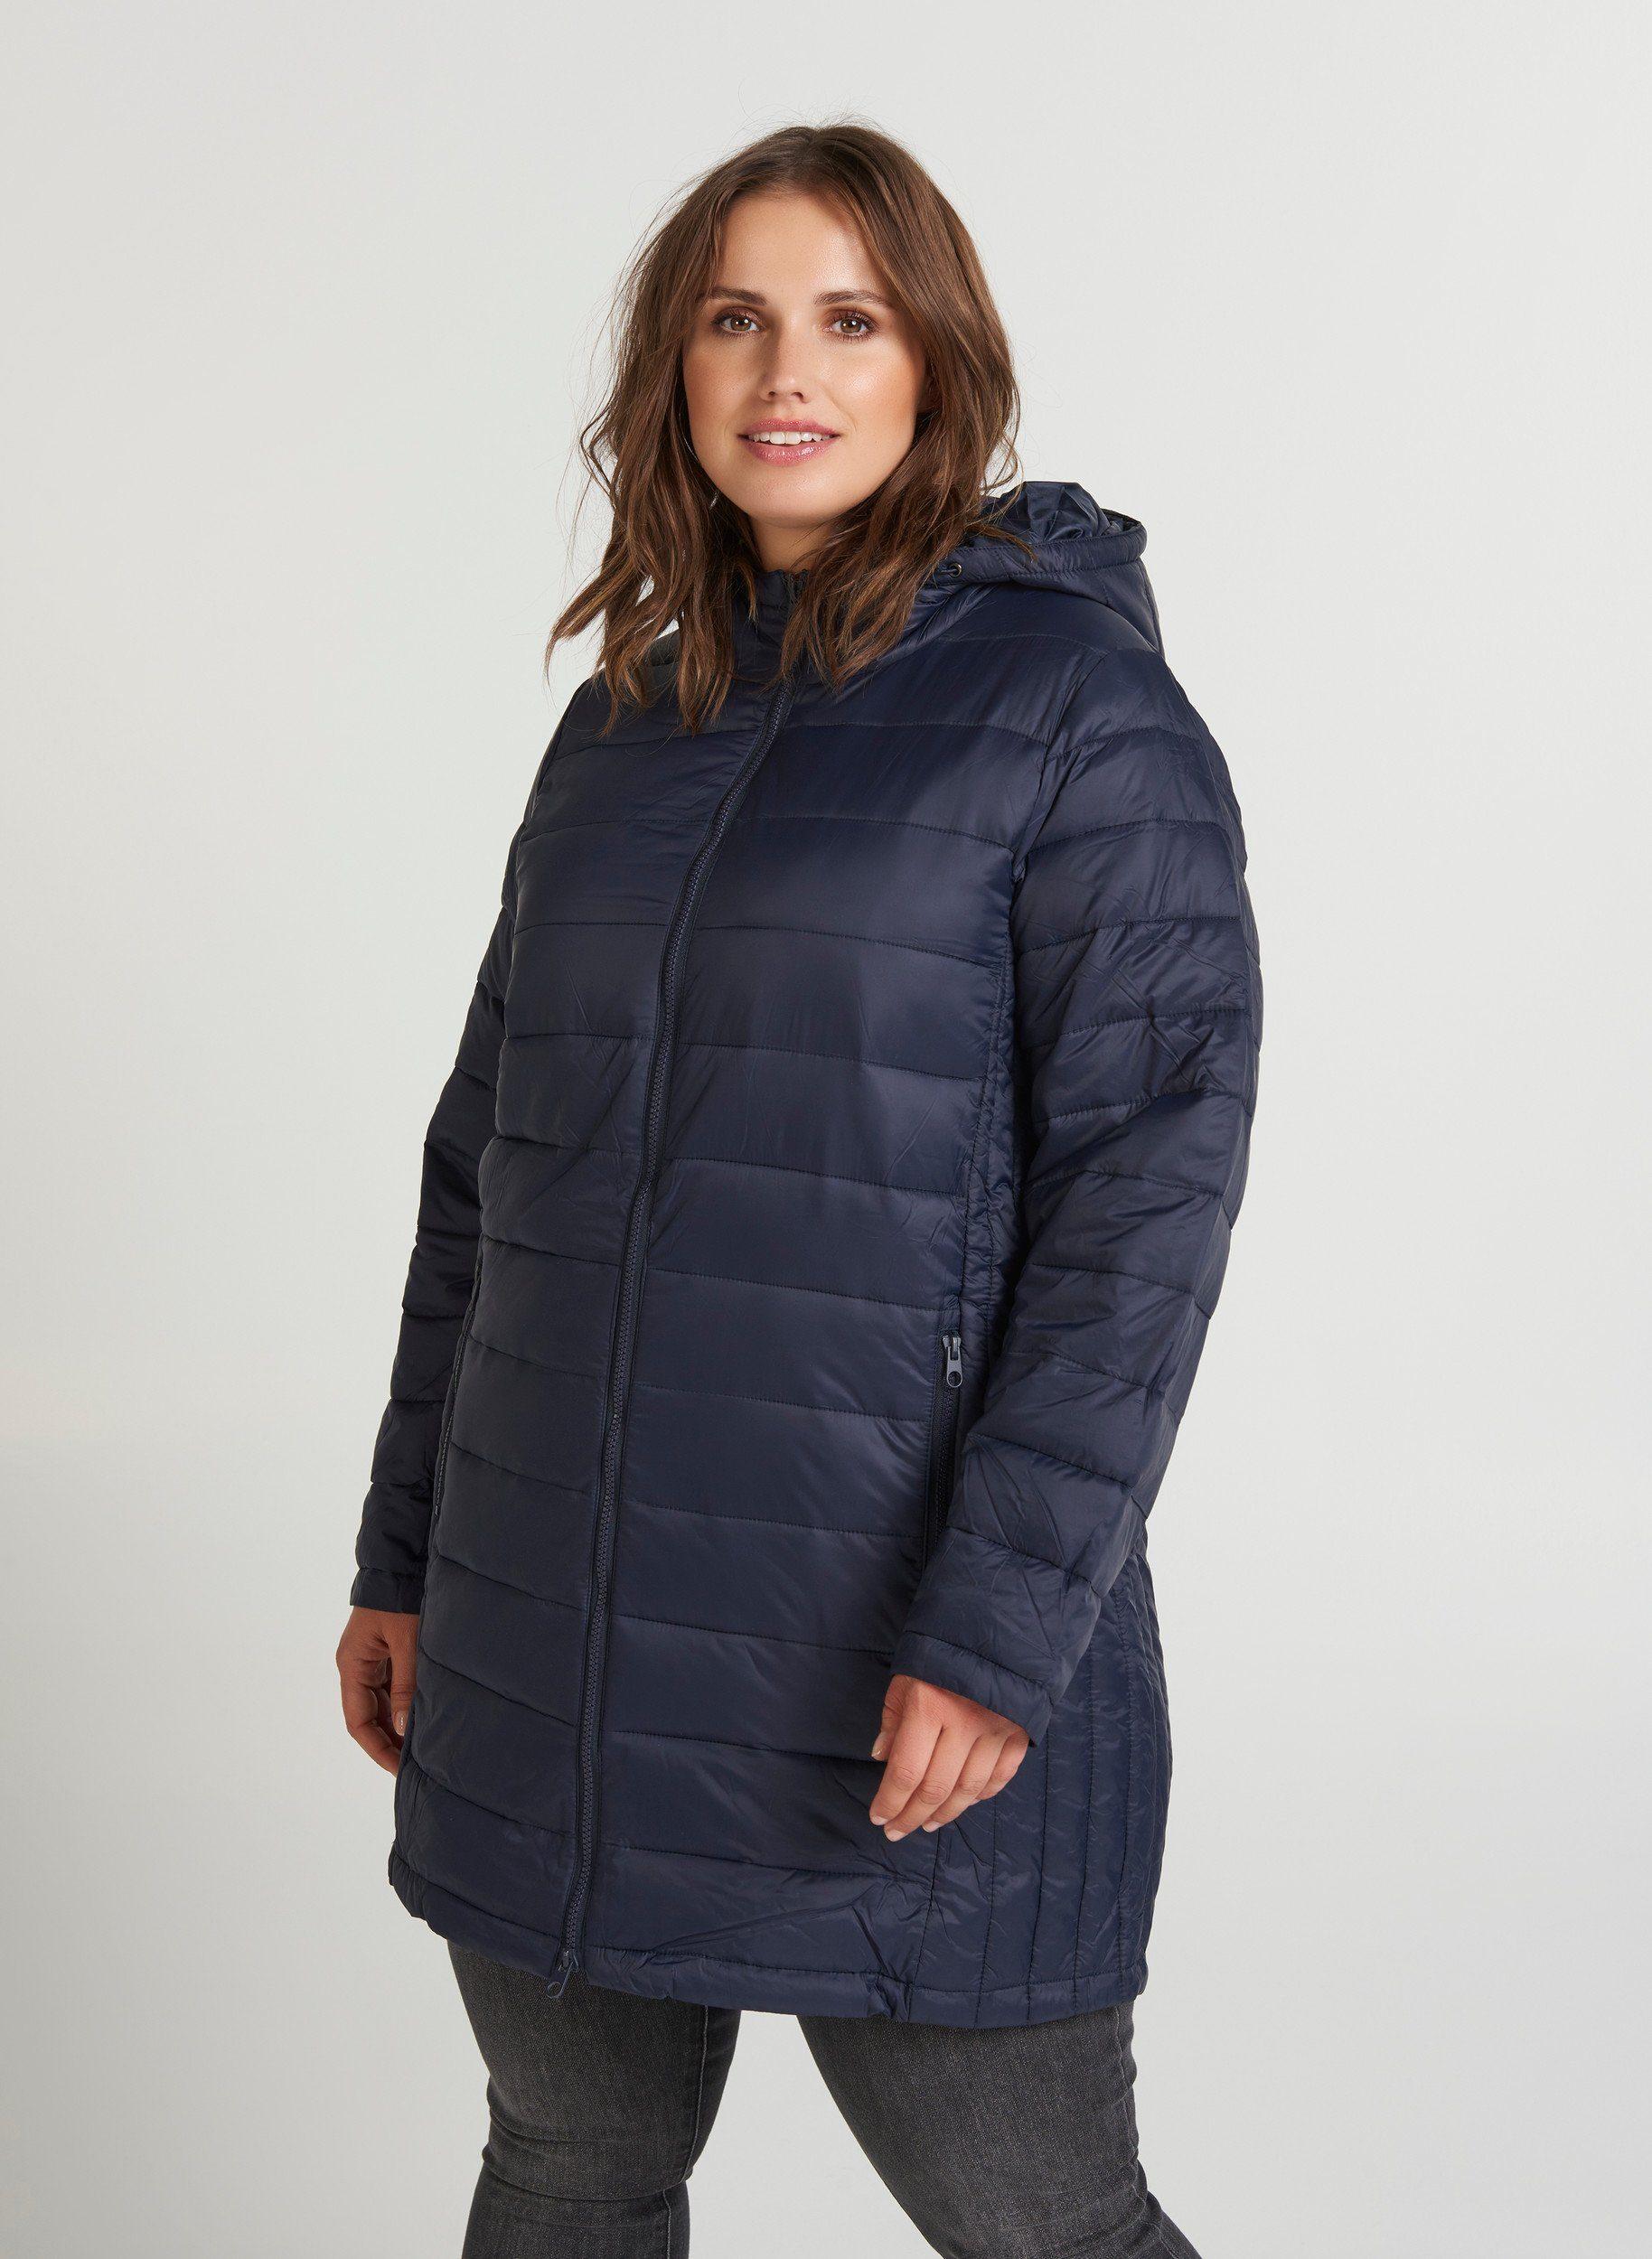 Zizzi Outdoorjacke Damen Große Größen Jacke Kapuze Stepp Parka Warm Winterjacke, Kapuze mit Tunnelzug online kaufen | OTTO